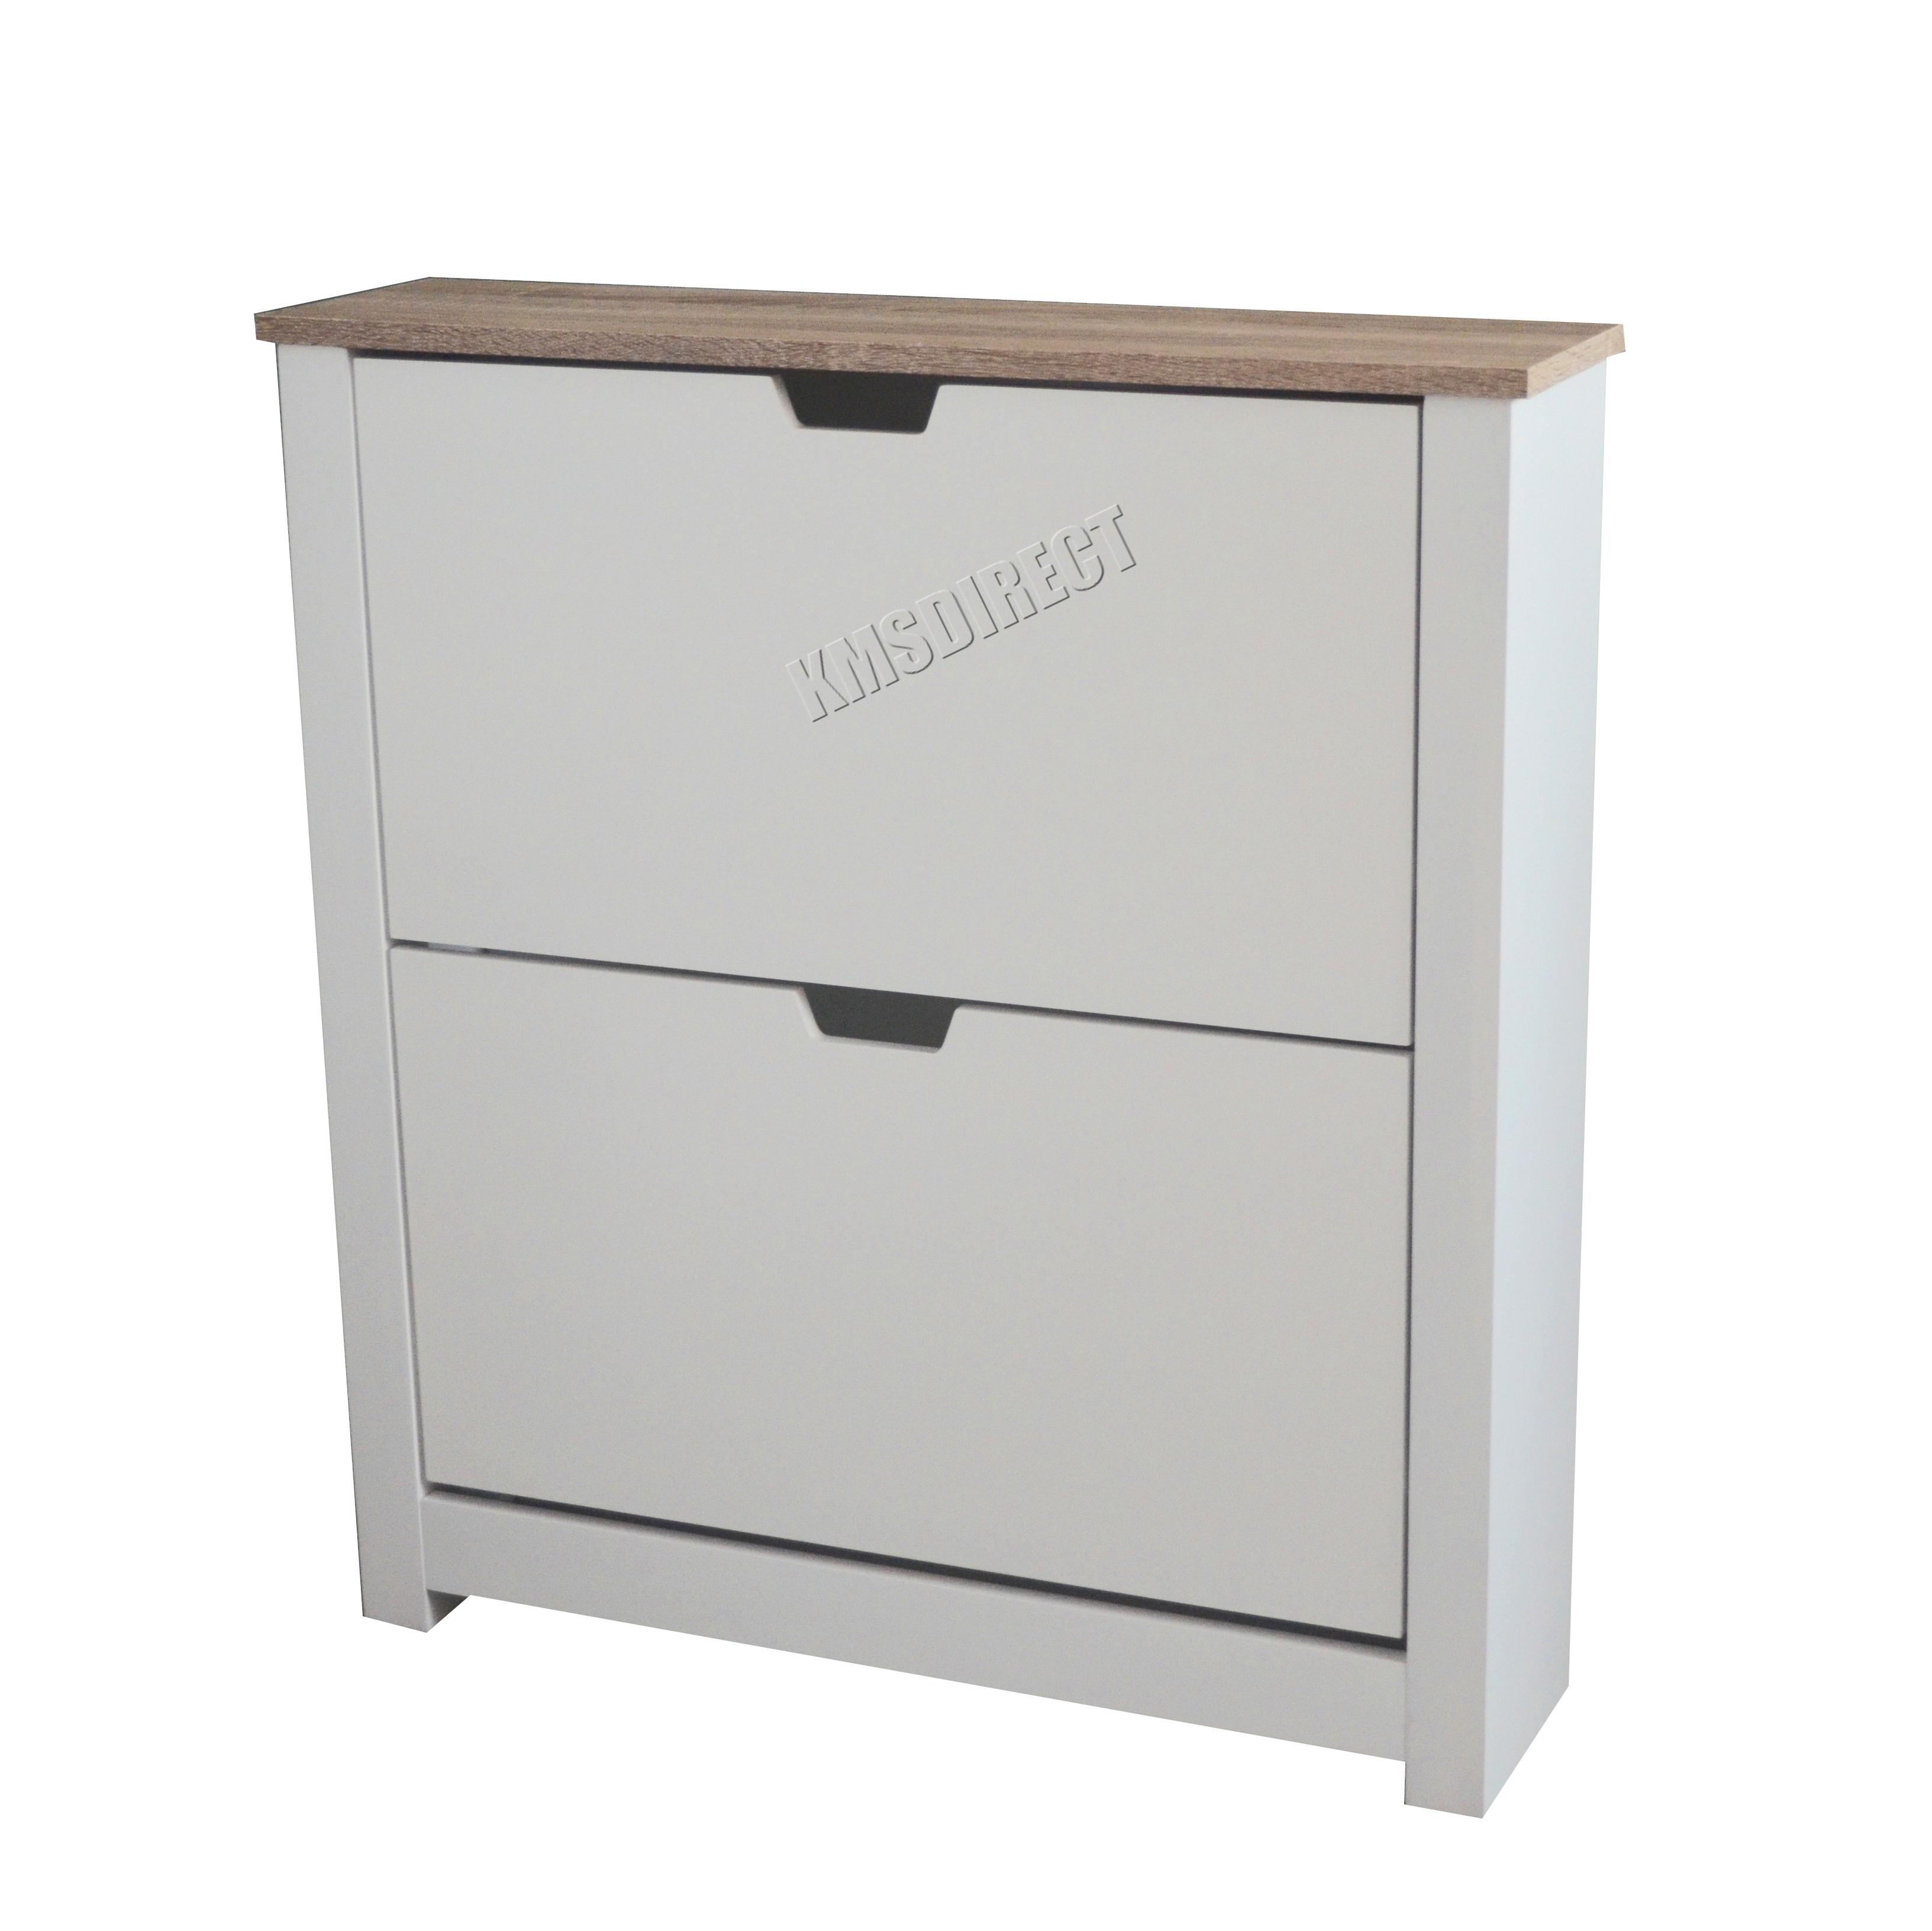 FoxHunter Wooden Shoe Storage Cabinet 2 3 Drawer Footwear Stand ...